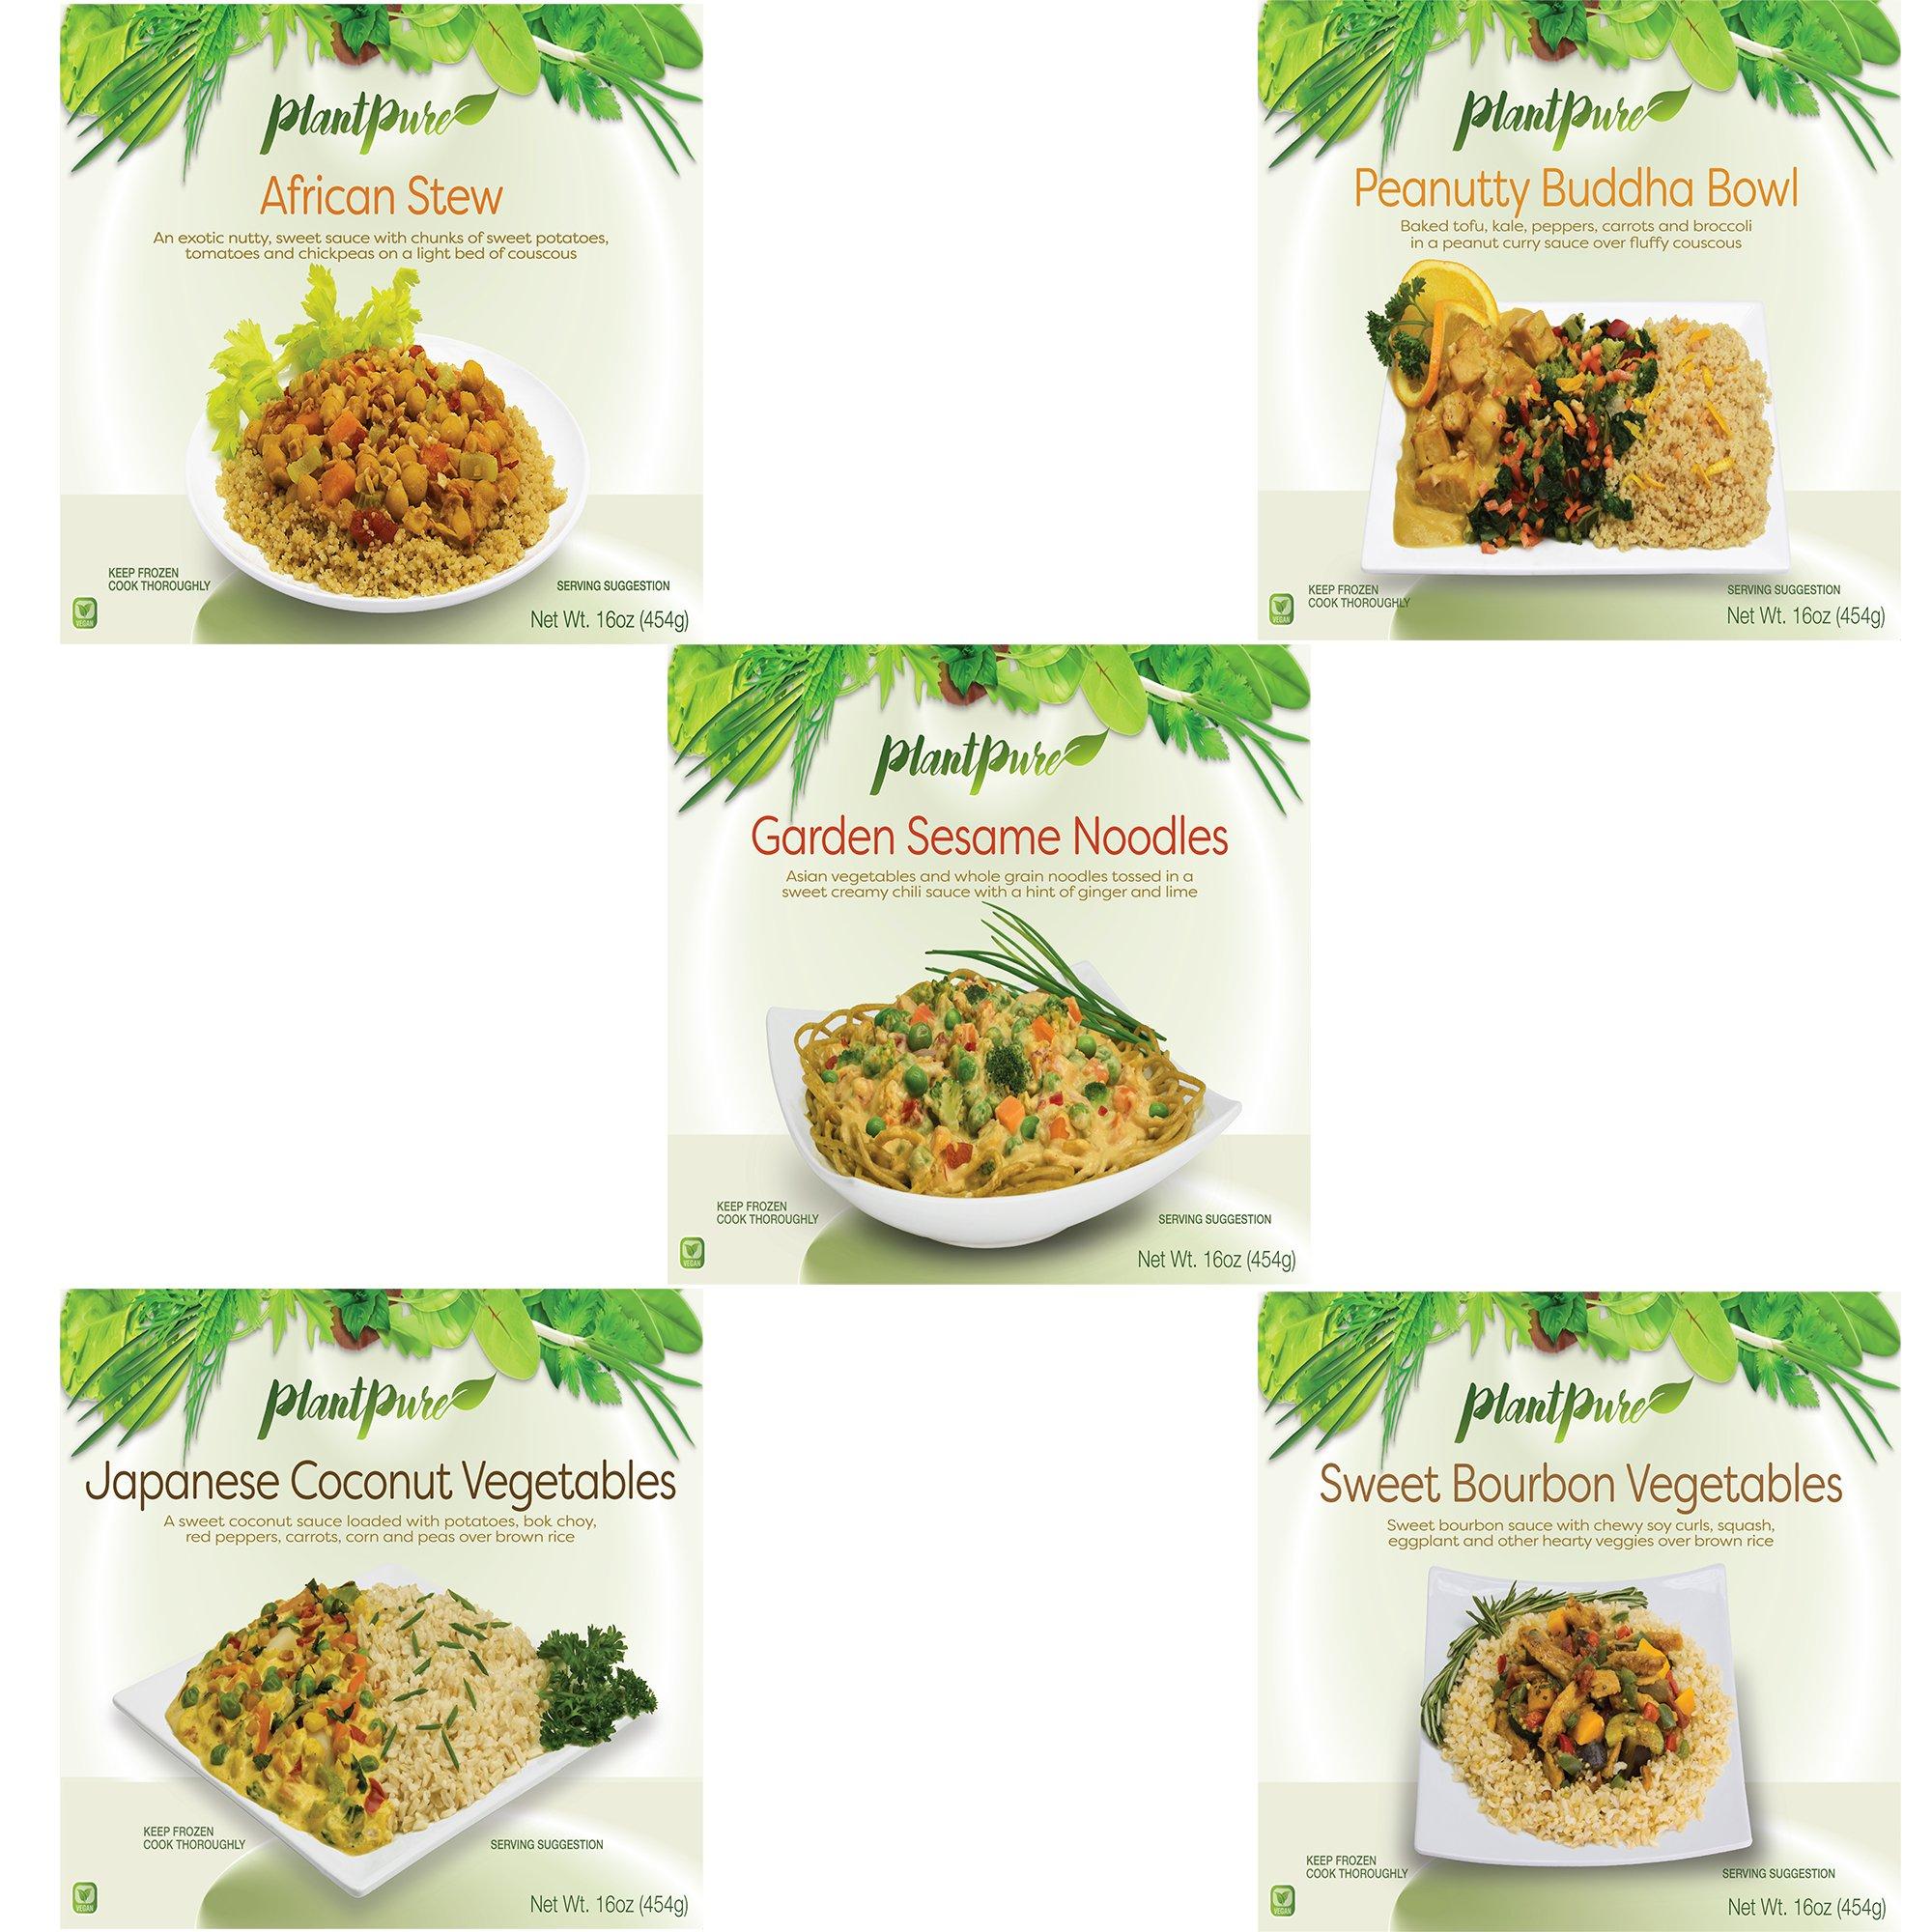 PlantPure 5 Pack Vegan Plant Based Frozen Entrees, 16 oz